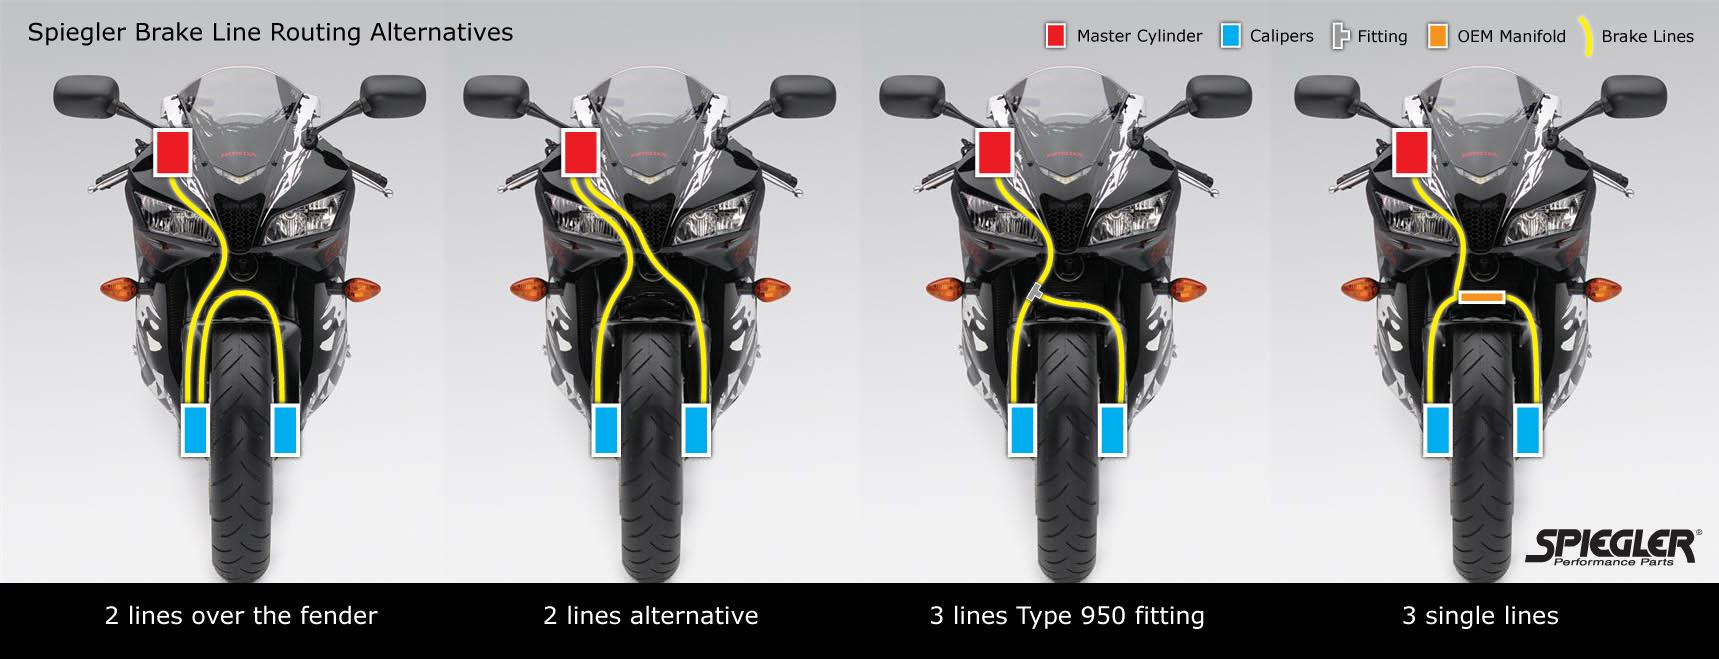 Flexibles de freno Spiegler-brake-line-routing